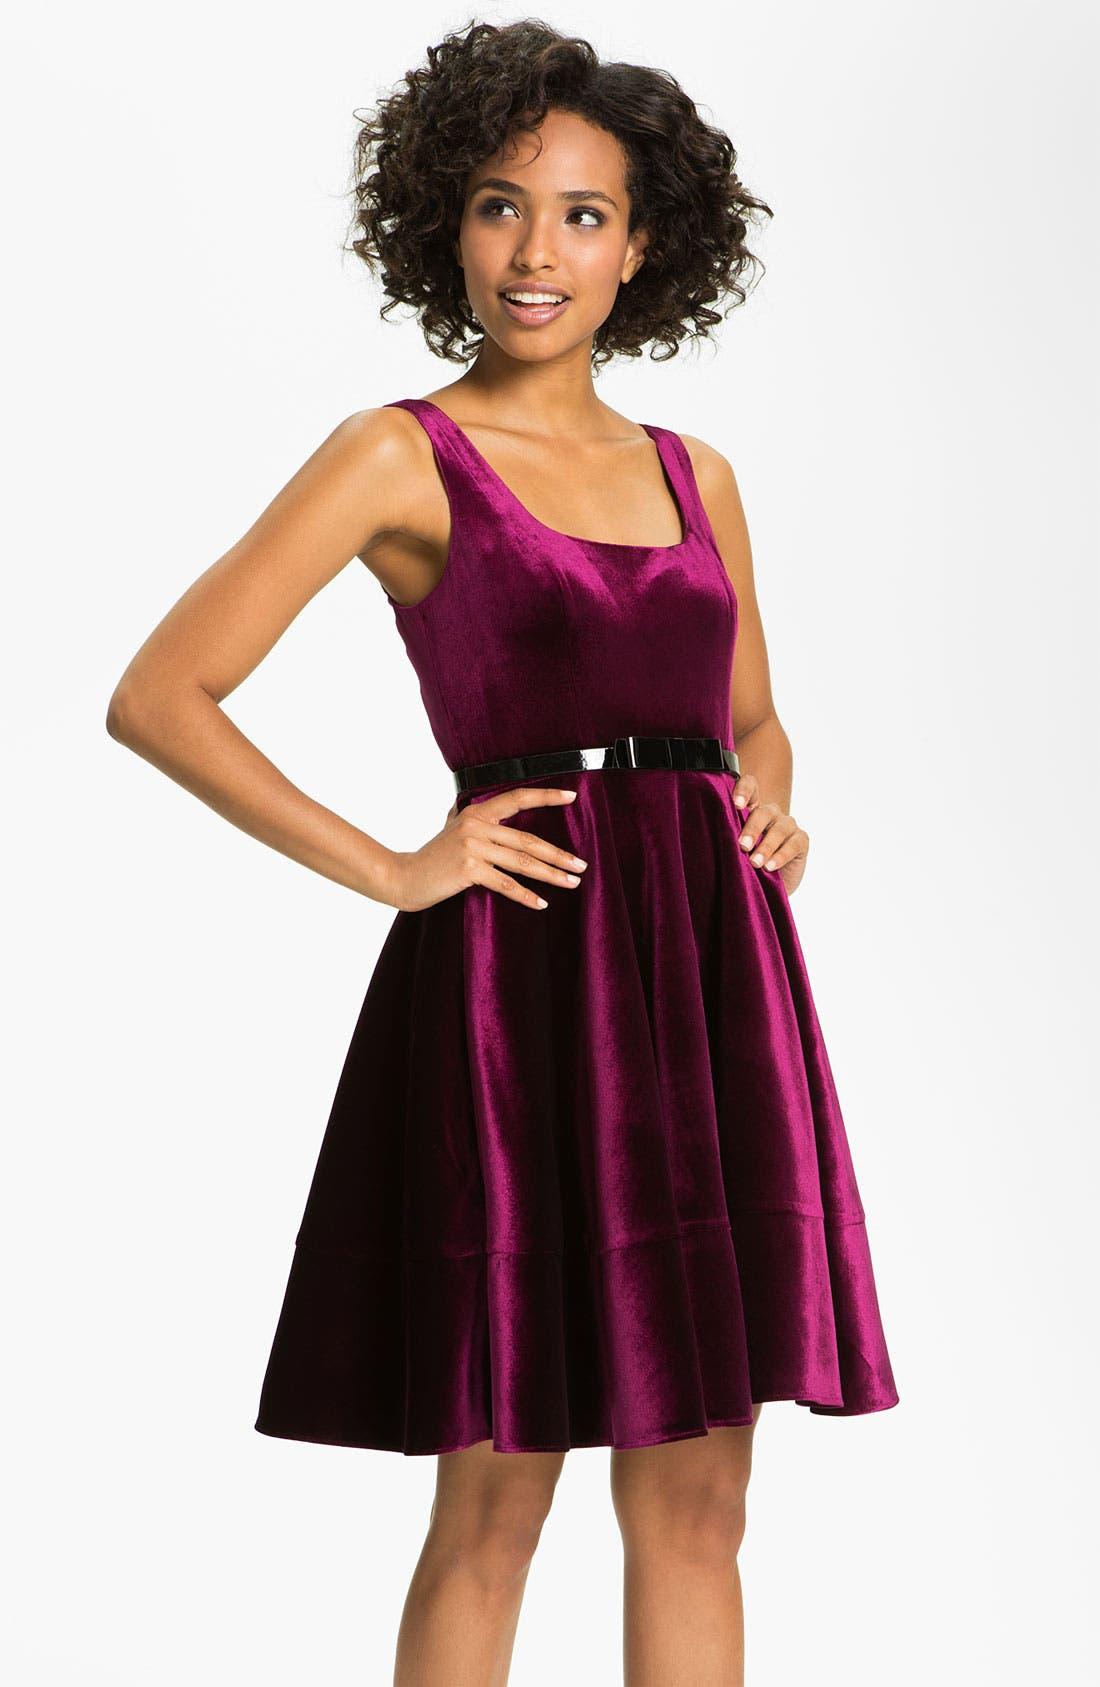 Alternate Image 1 Selected - Adrianna Papell Scoop Neck Velvet Dress (Petite)